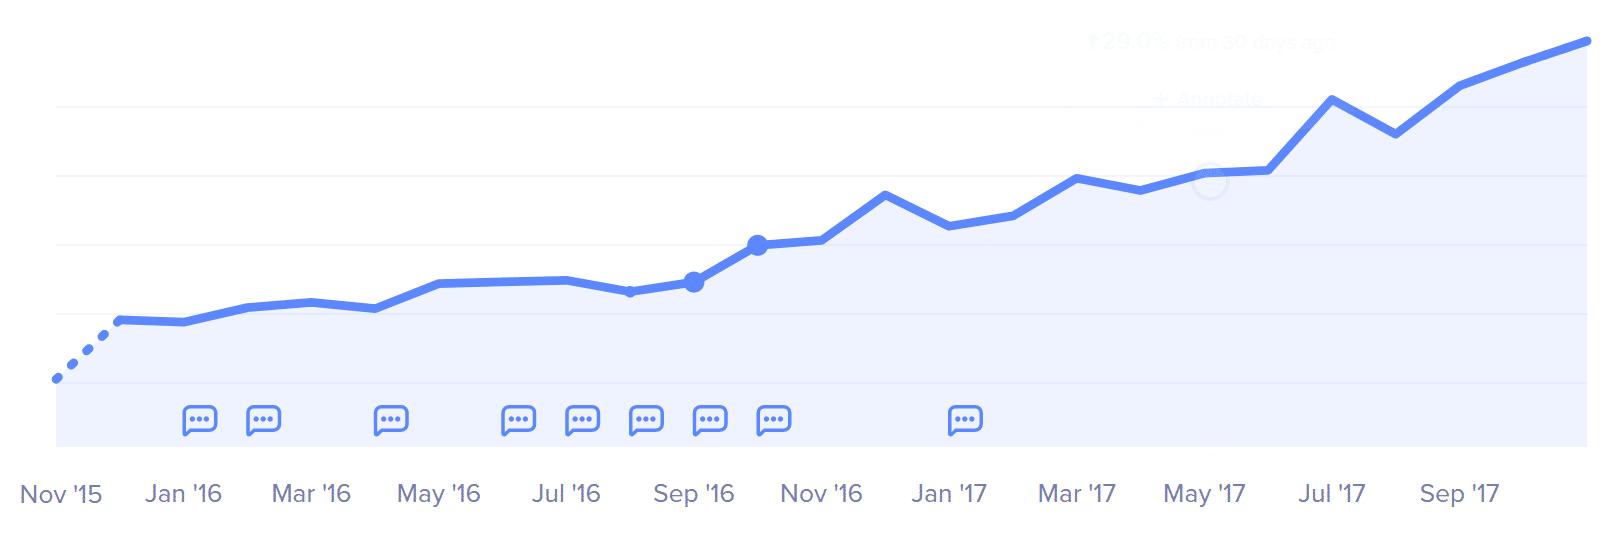 Kinsta net revenue